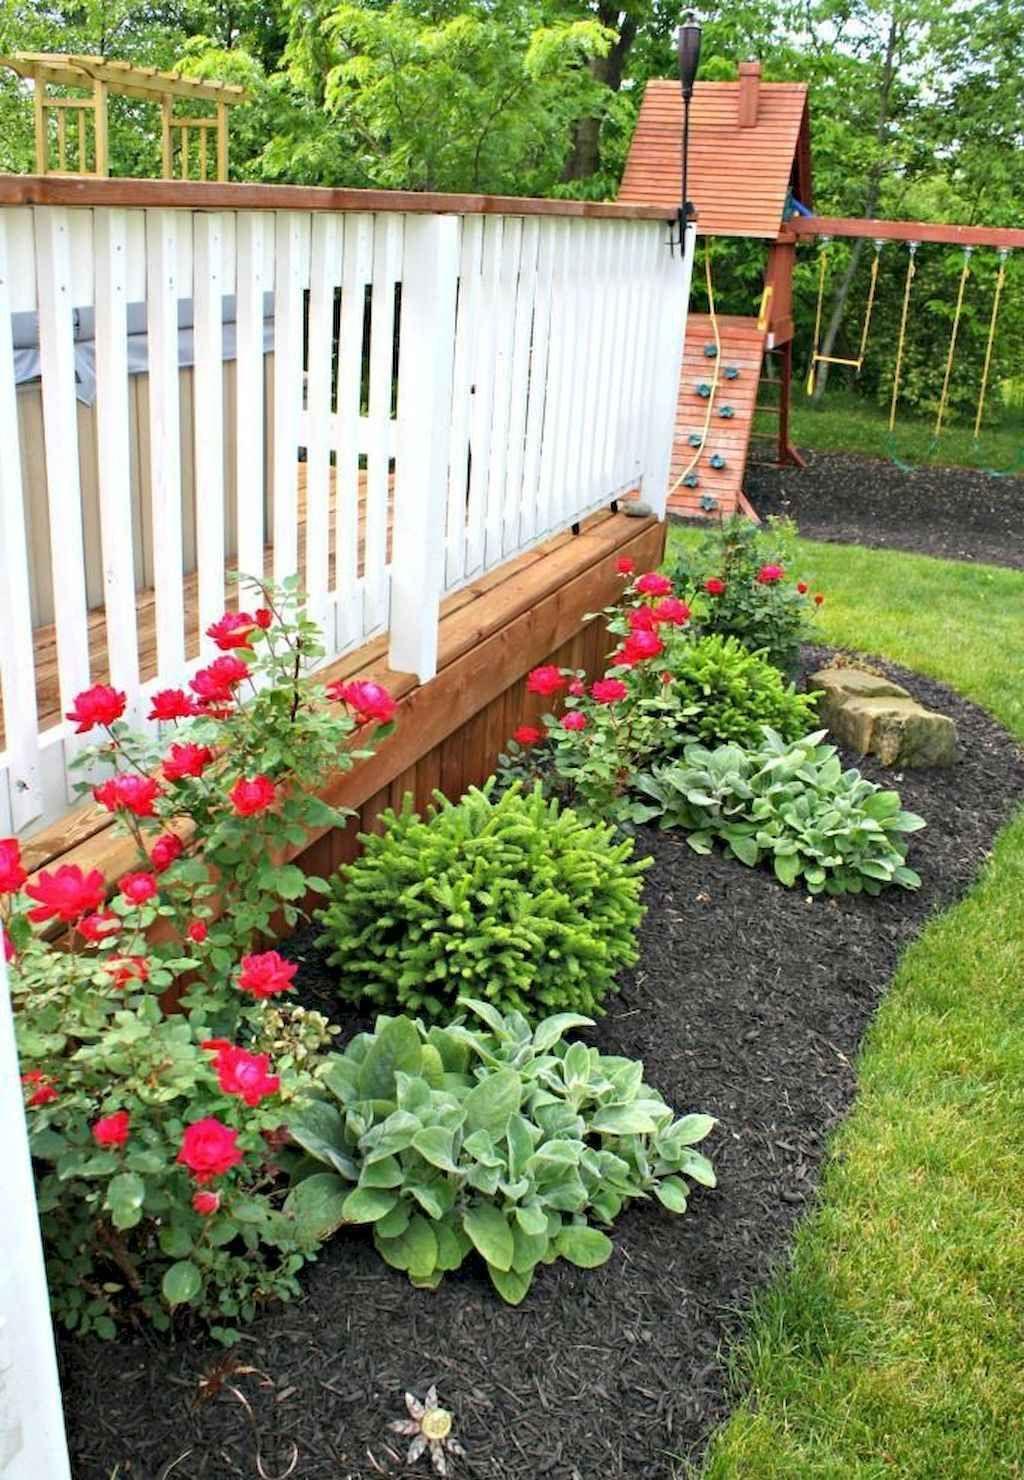 43 affordable backyard garden design ideas on a budget on backyard landscaping ideas with minimum budget id=70607